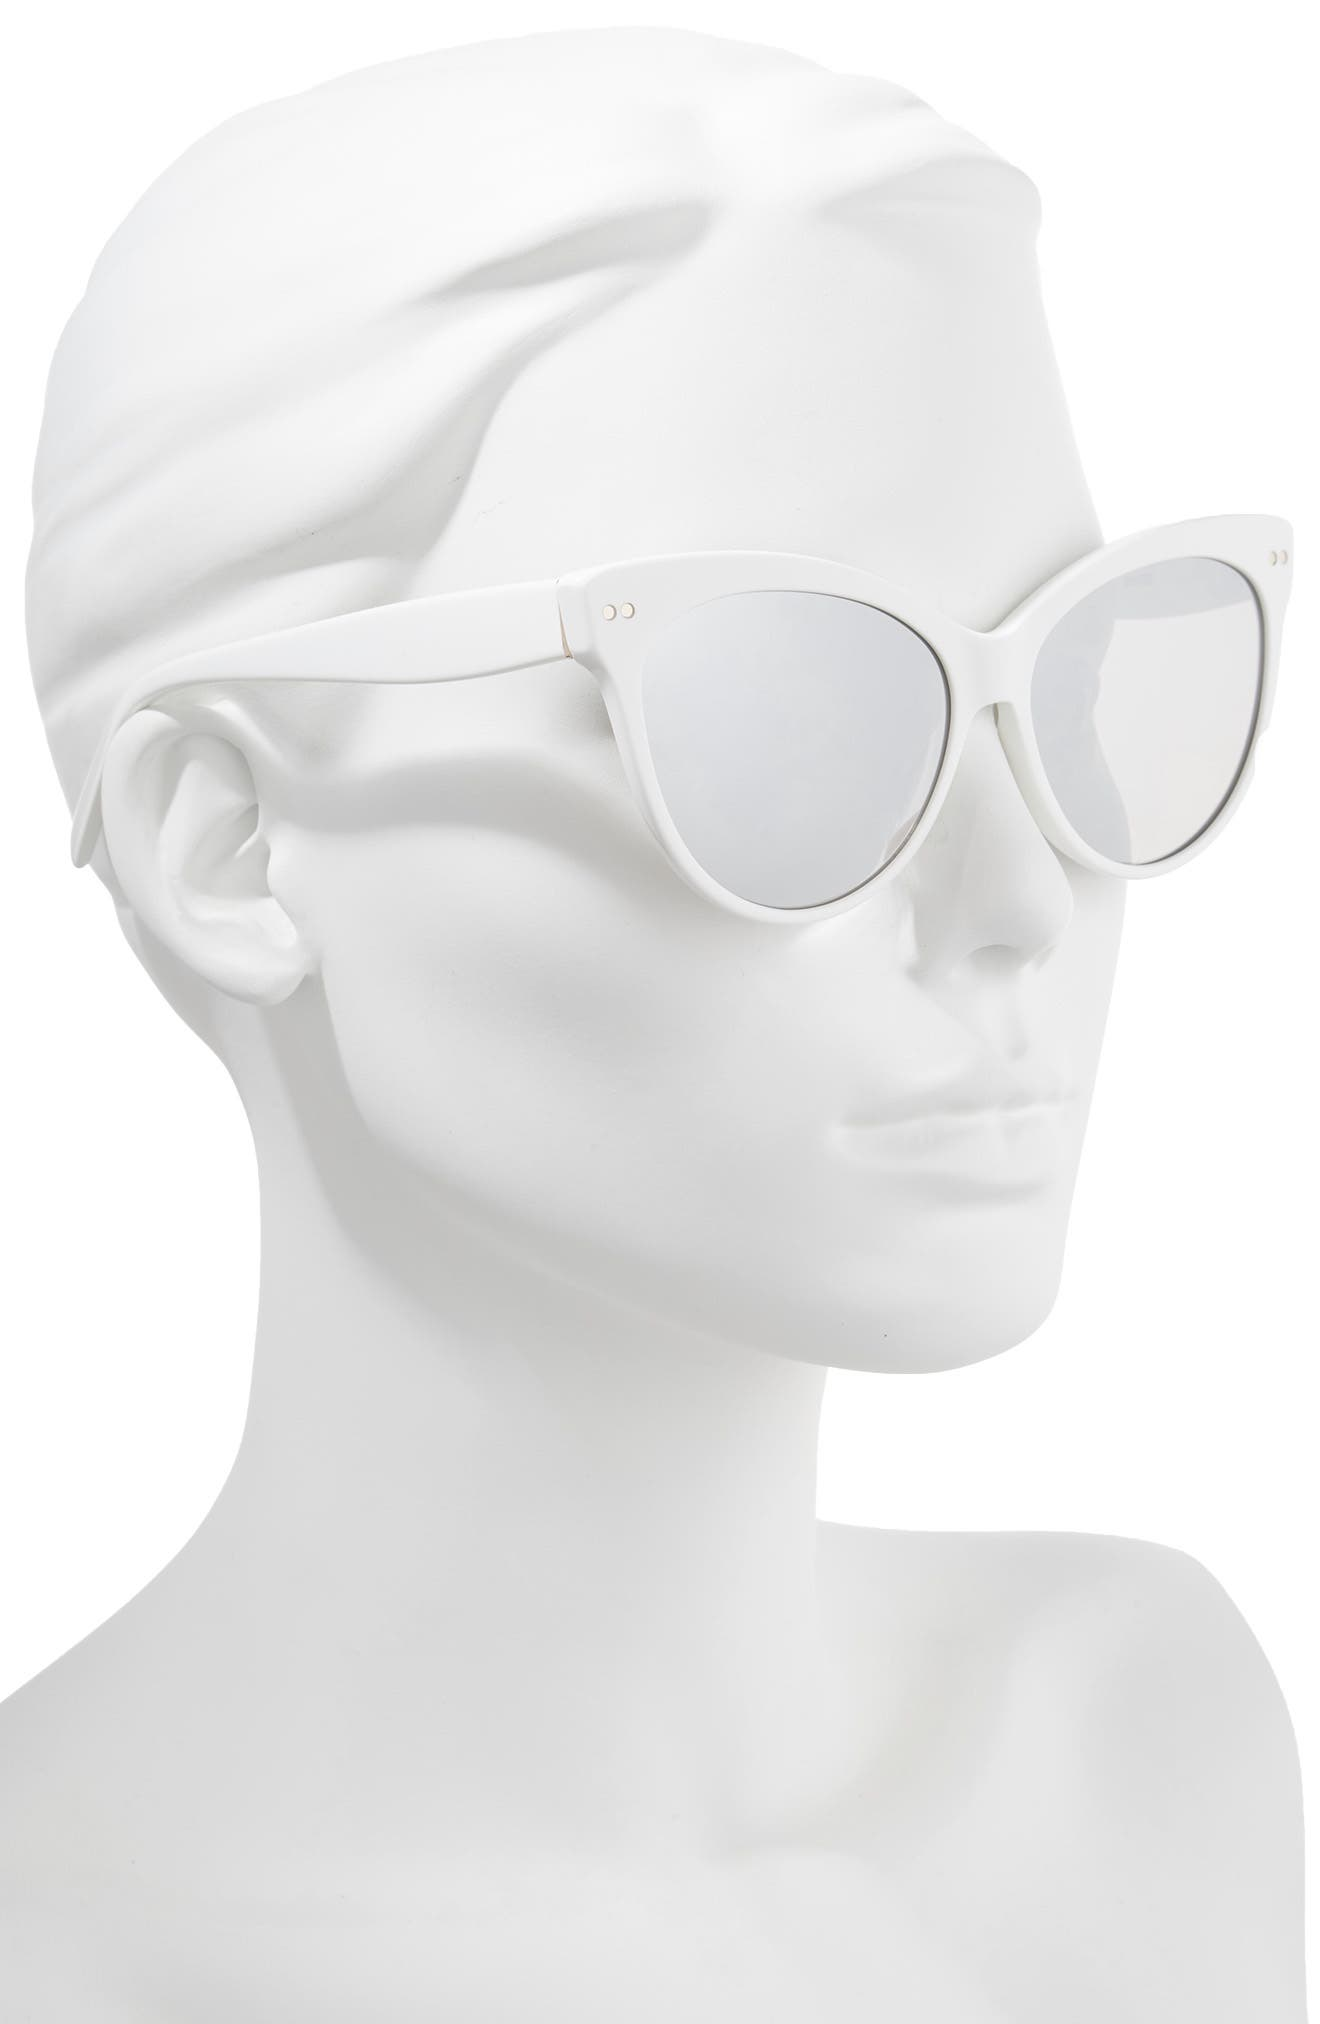 Audrey 60mm Cat Eye Sunglasses,                             Alternate thumbnail 2, color,                             WHITE